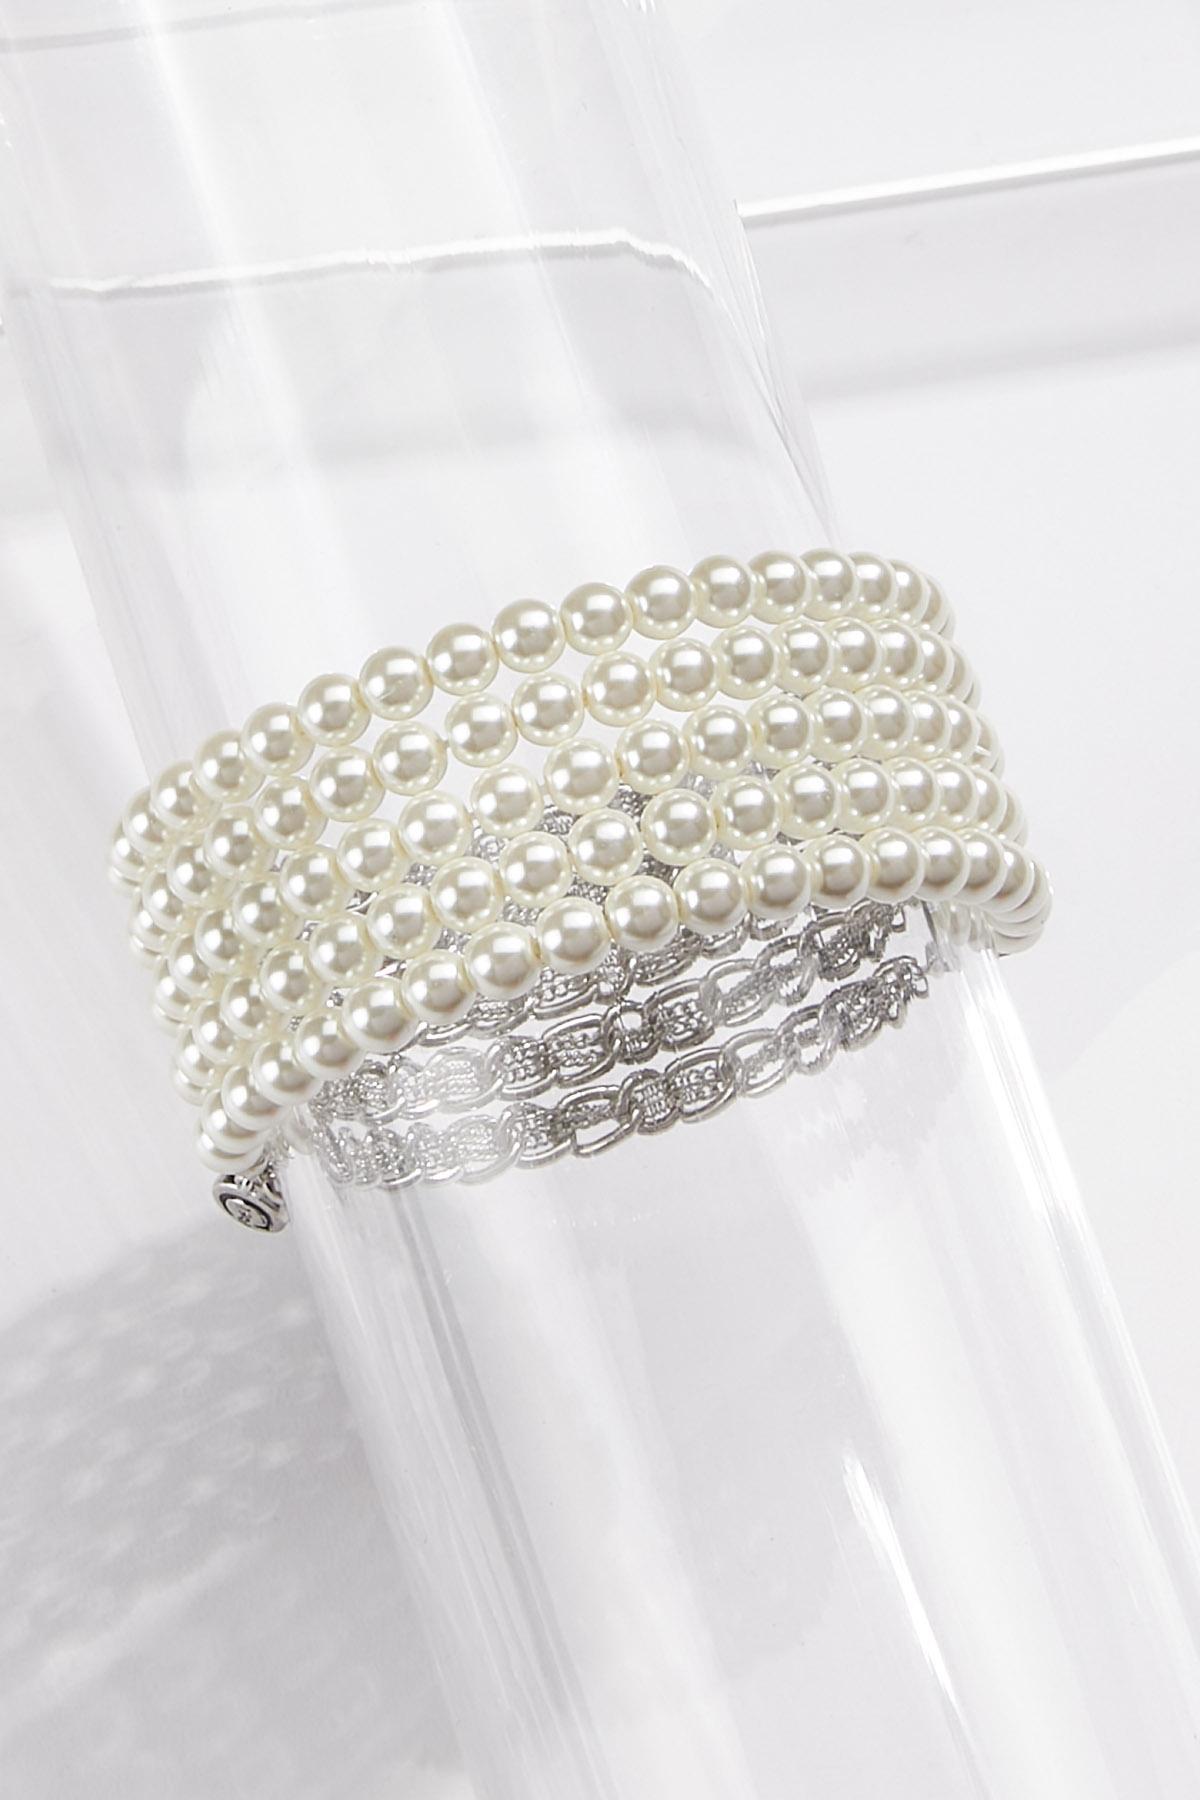 Layered Glam Stretch Bracelet